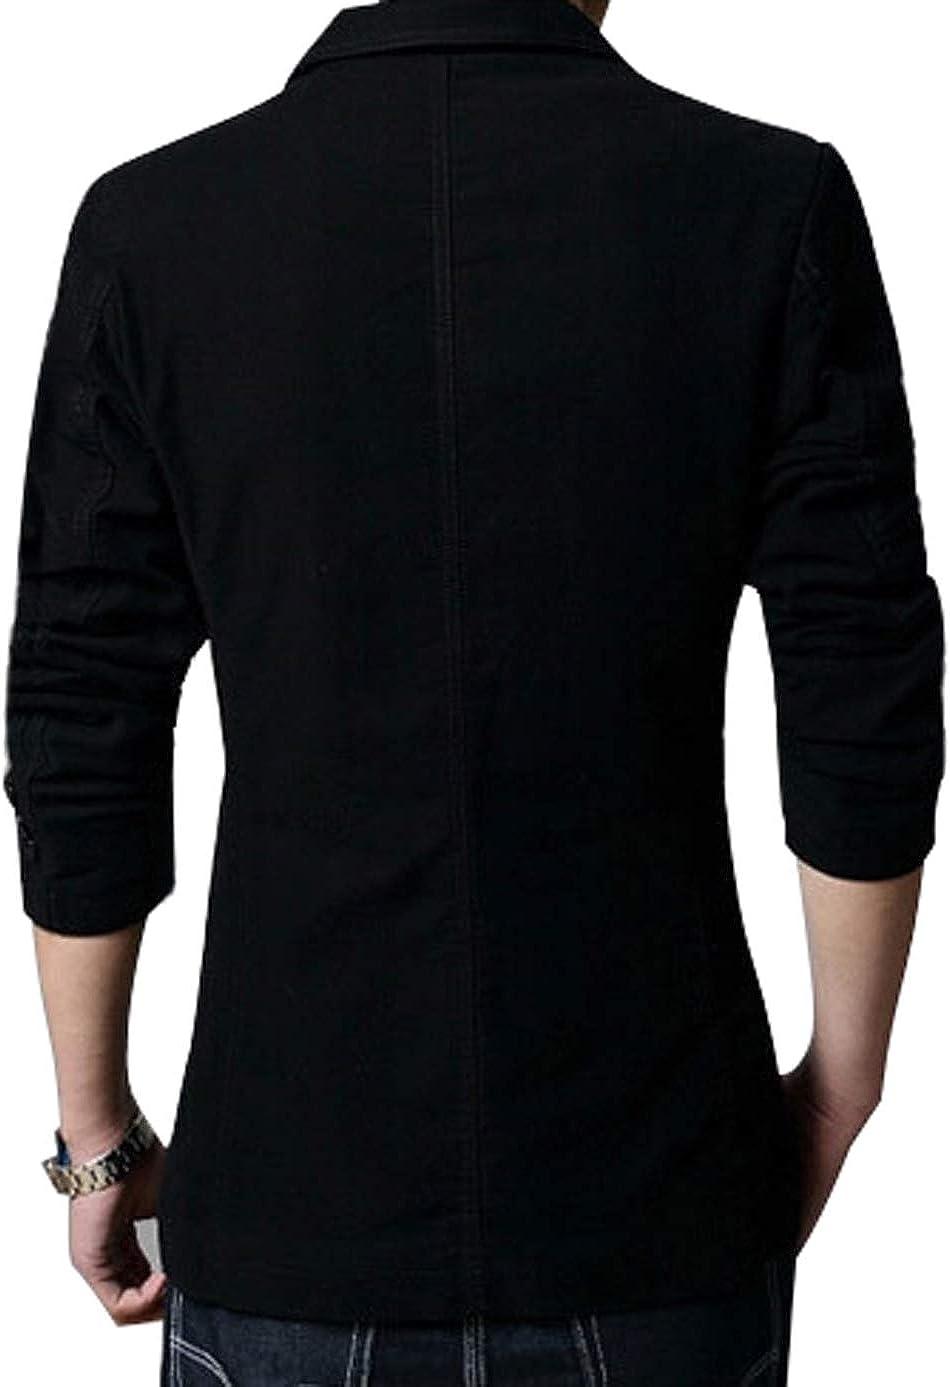 chouyatou Men's Slim 2-Button Single Breasted Cotton Lightweight Blazer Jacket Sport Coat